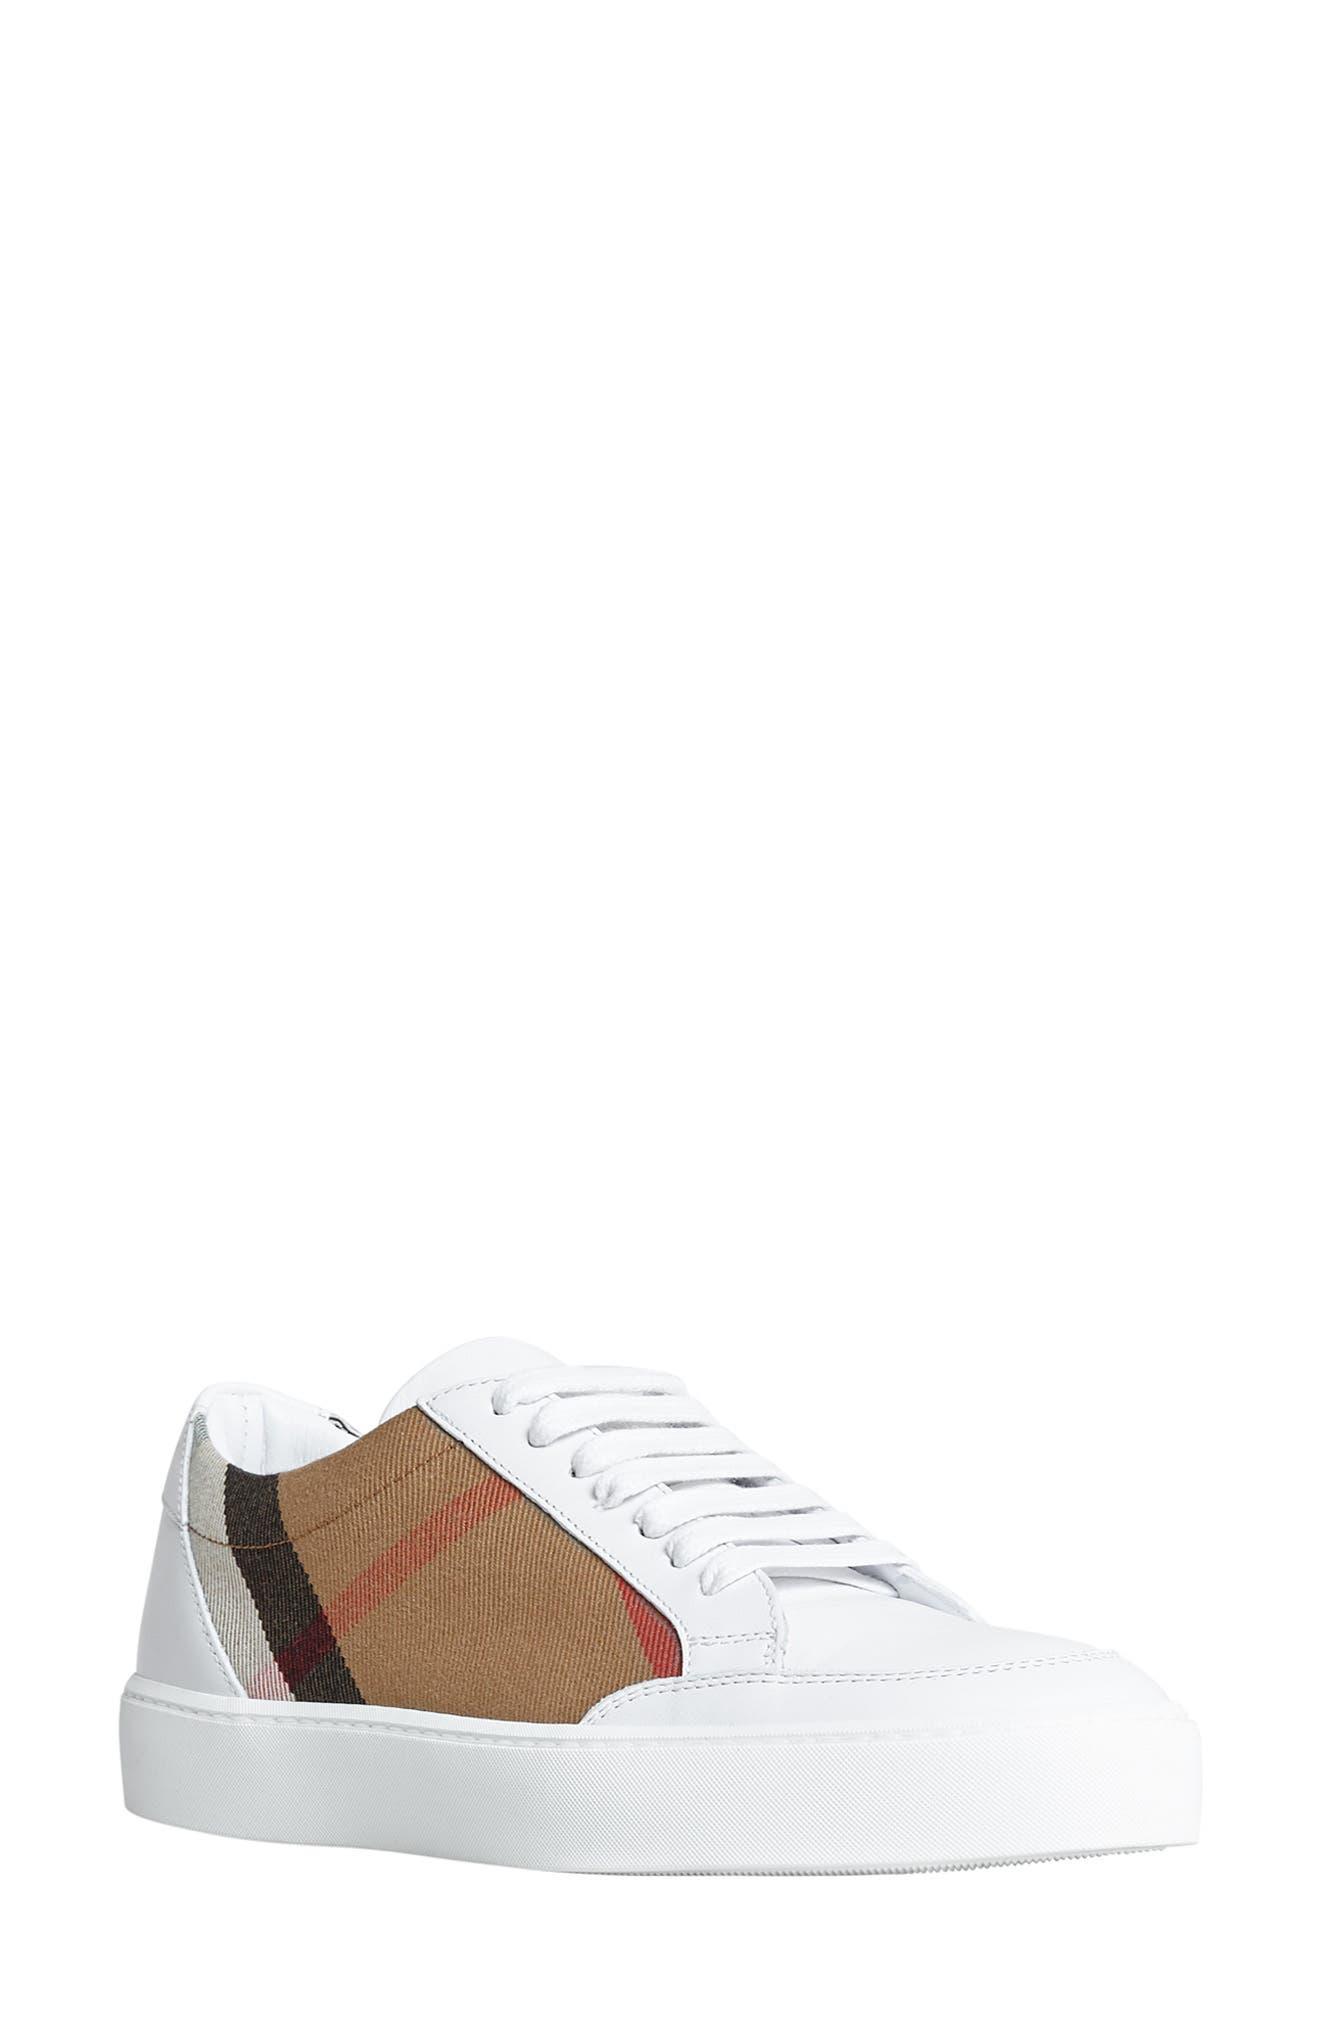 BURBERRY Salmond Sneaker, Main, color, WHITE